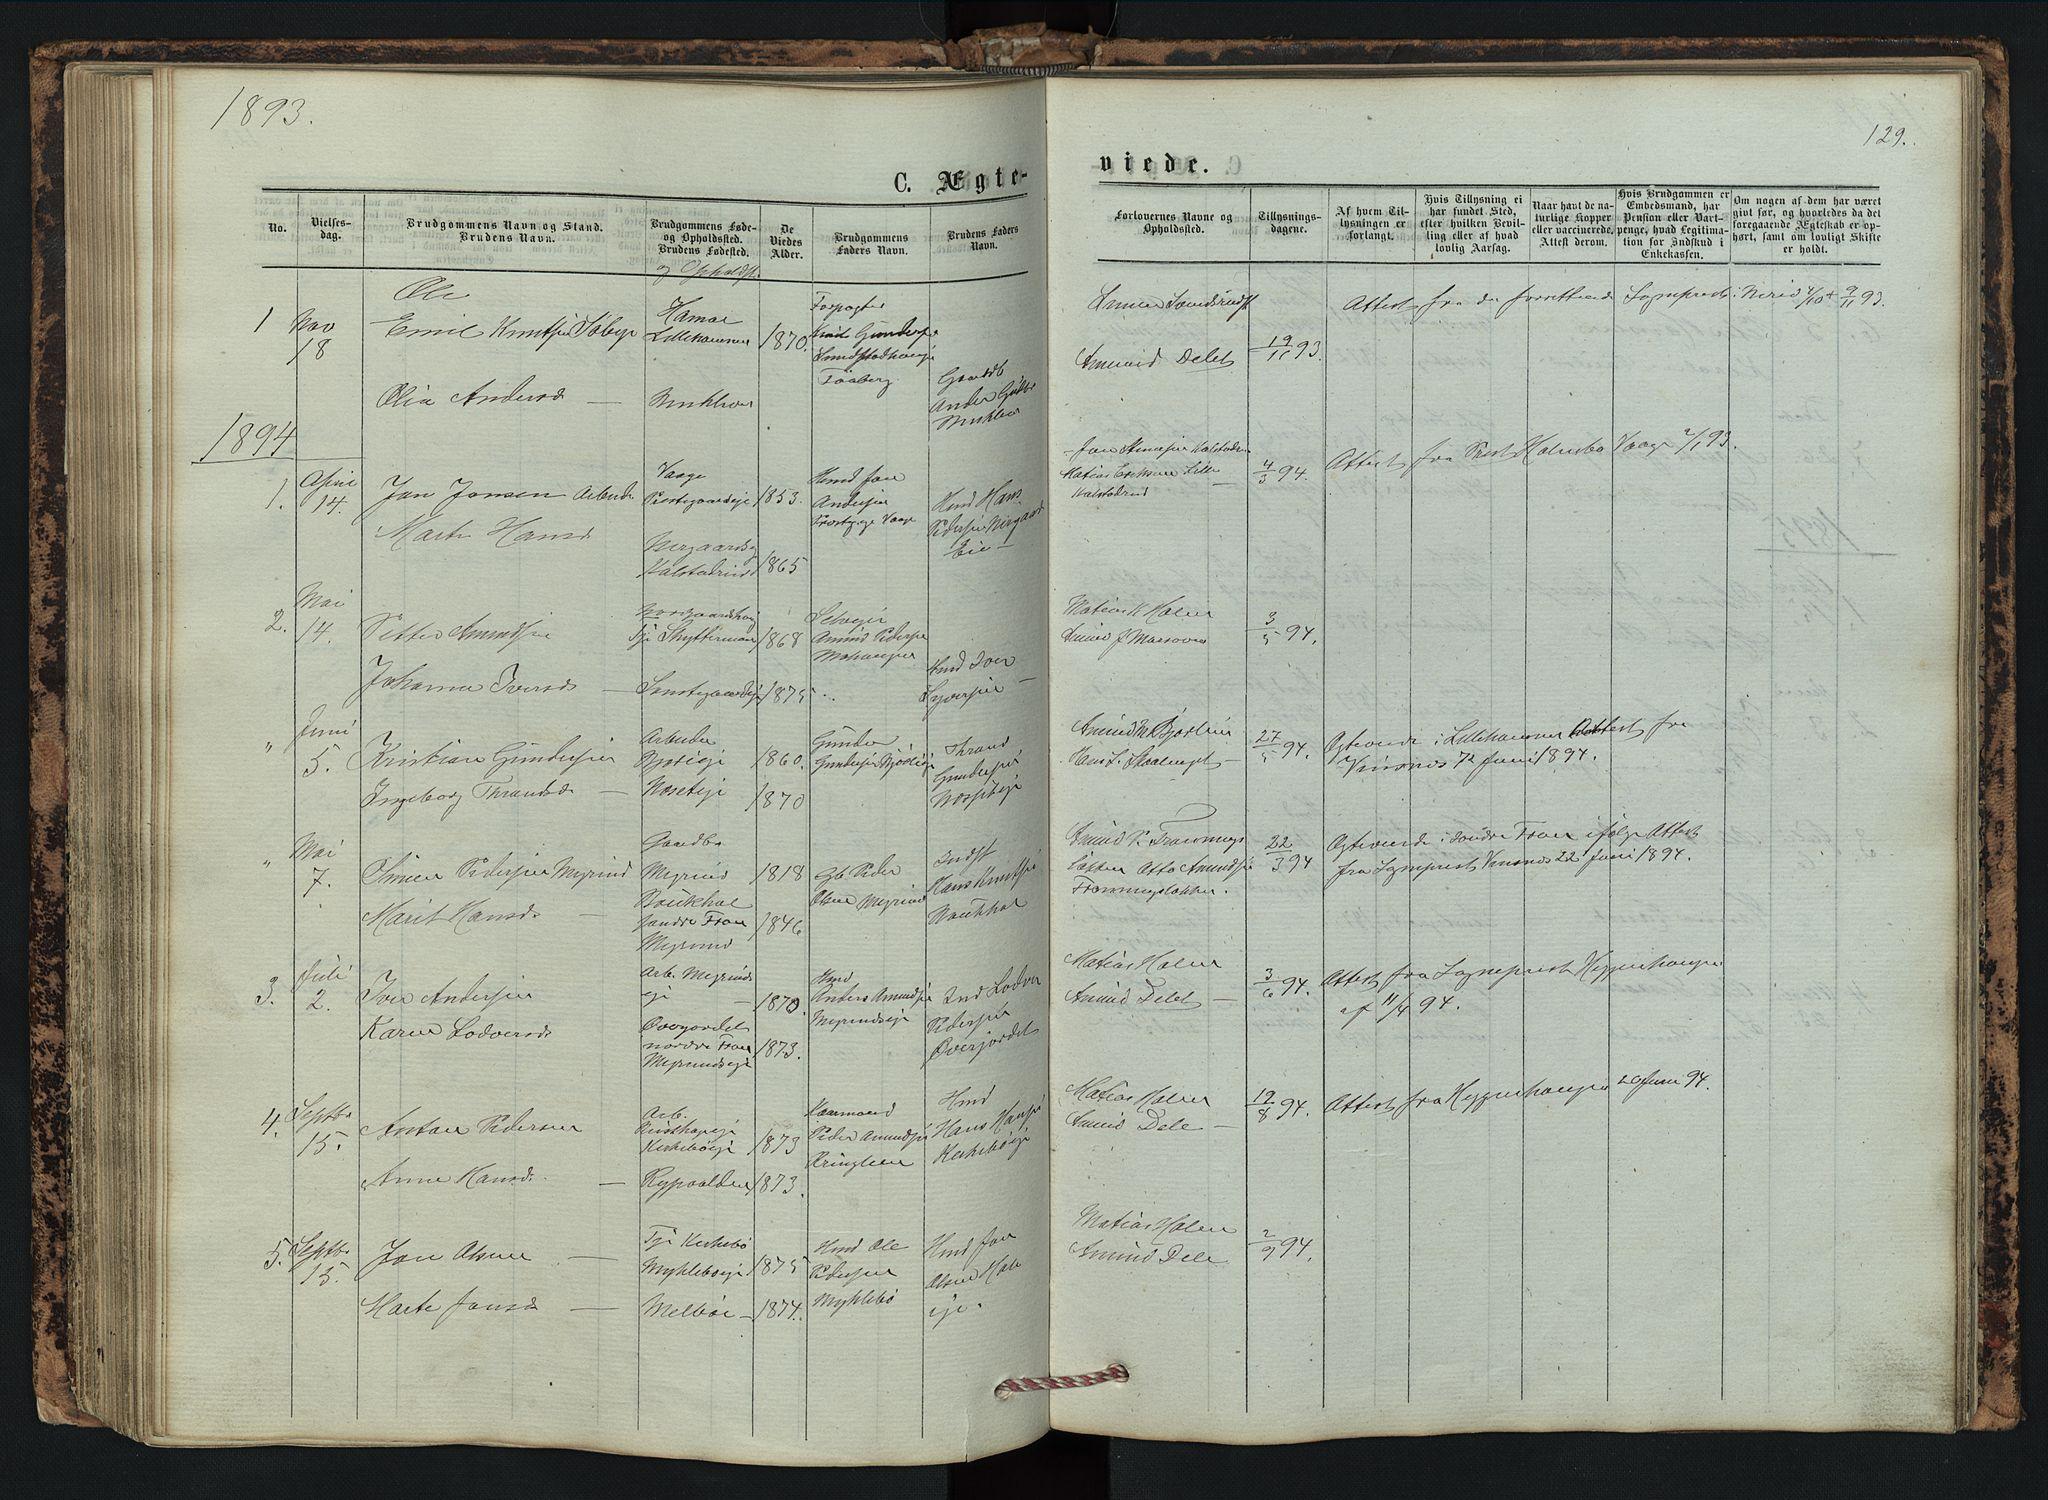 SAH, Vestre Gausdal prestekontor, Klokkerbok nr. 2, 1874-1897, s. 129